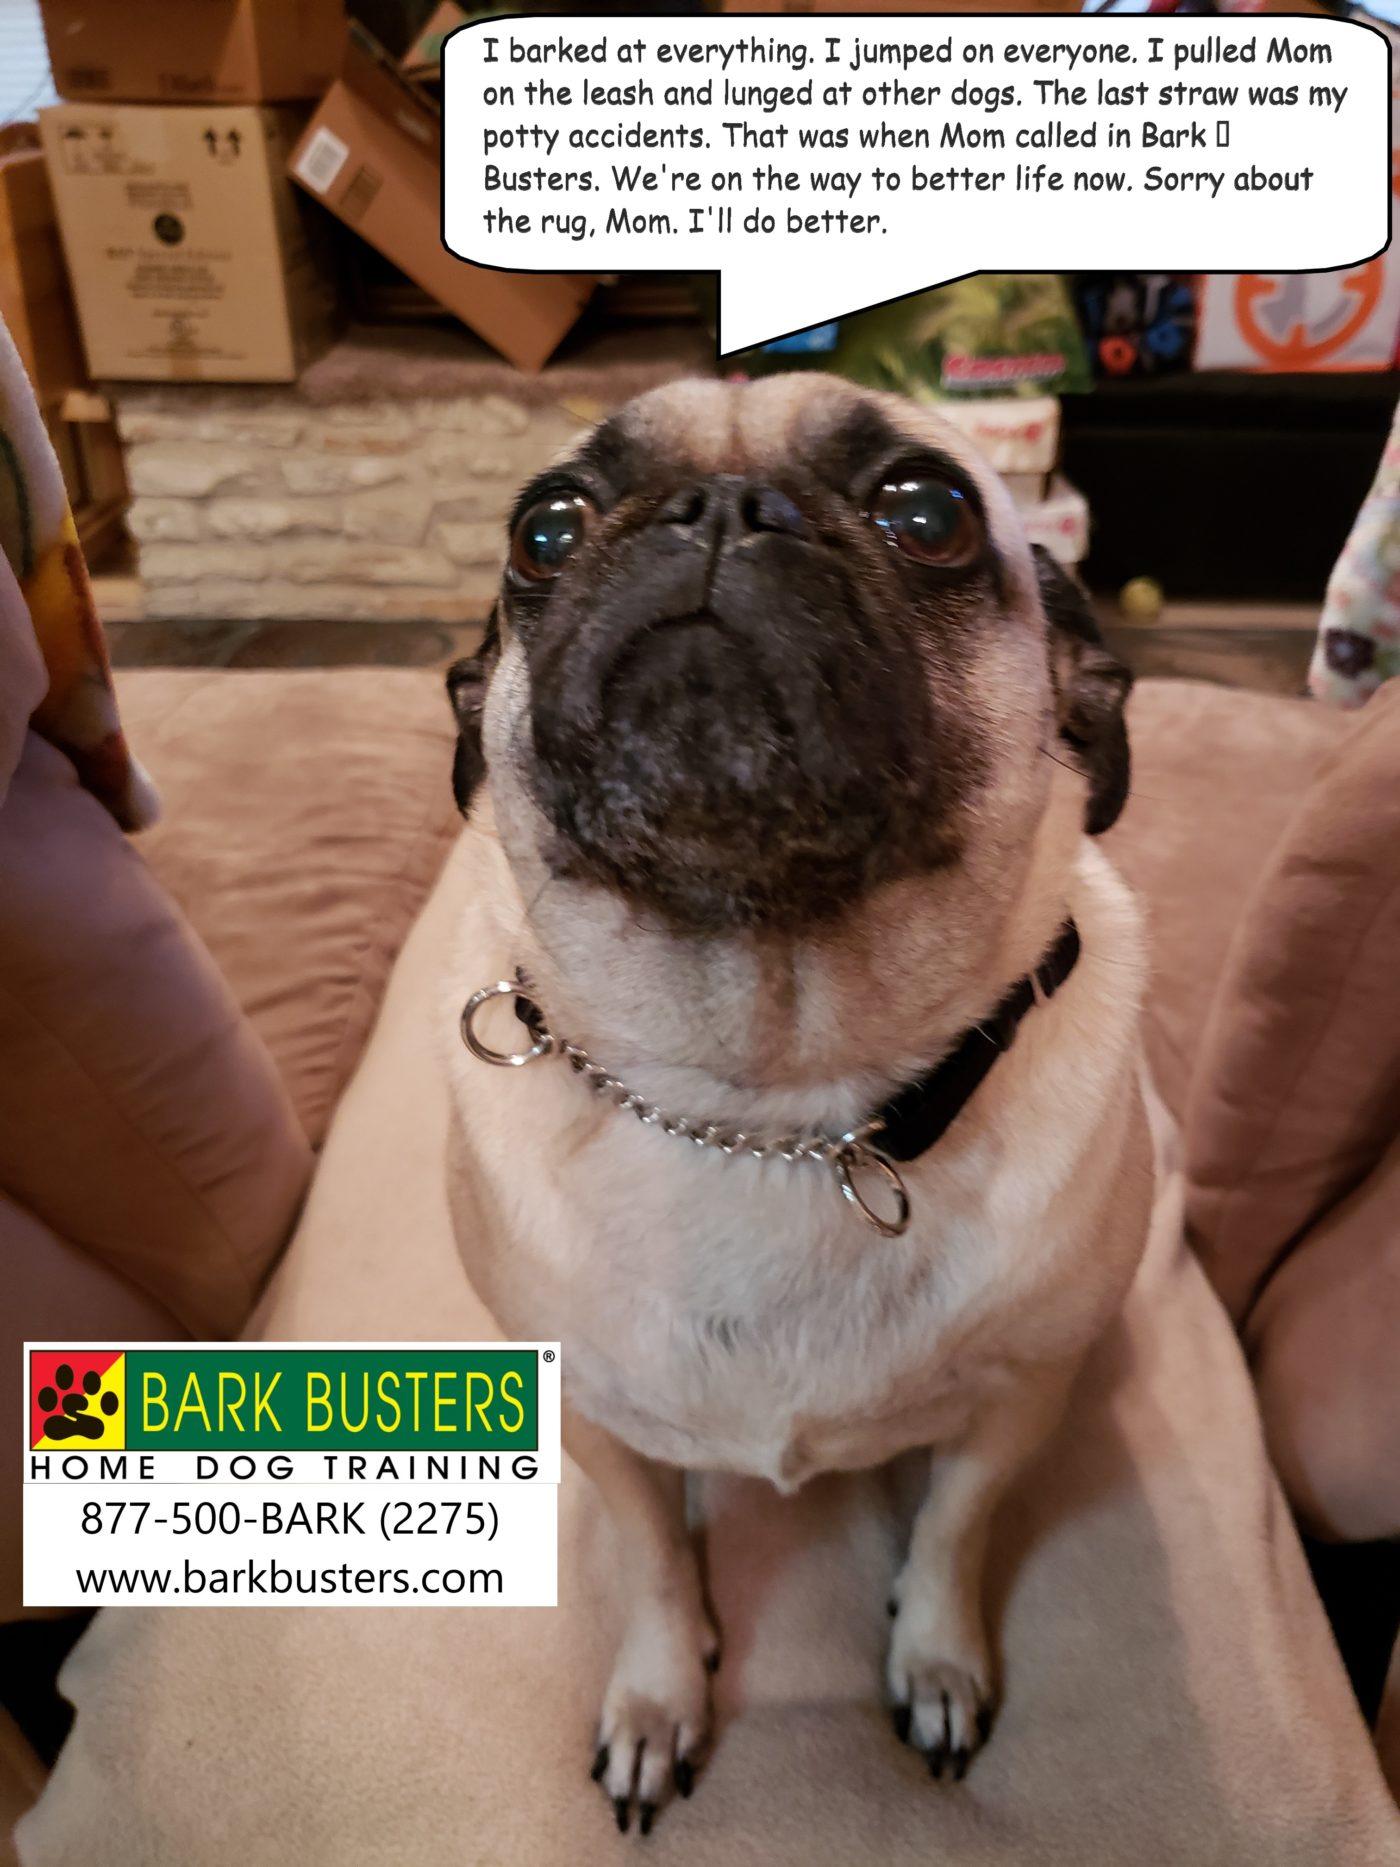 #pugdogtraining #dogsofbarkbusters #bestdogtrainingeastaustin #dogtrainerroundrock